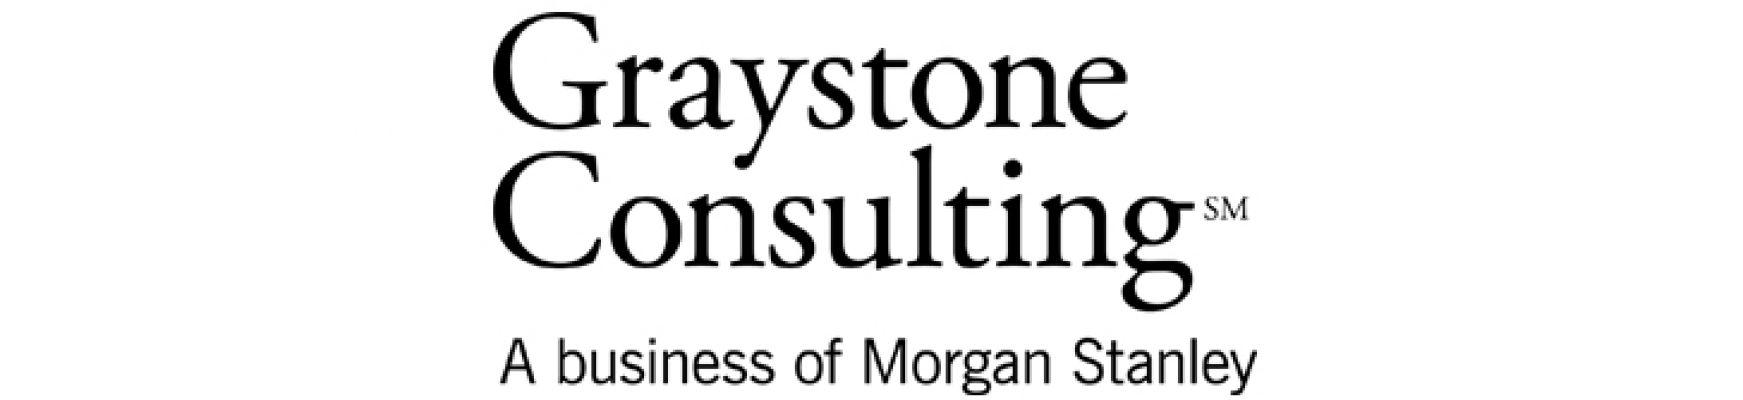 Graystone-Consulting-Logo